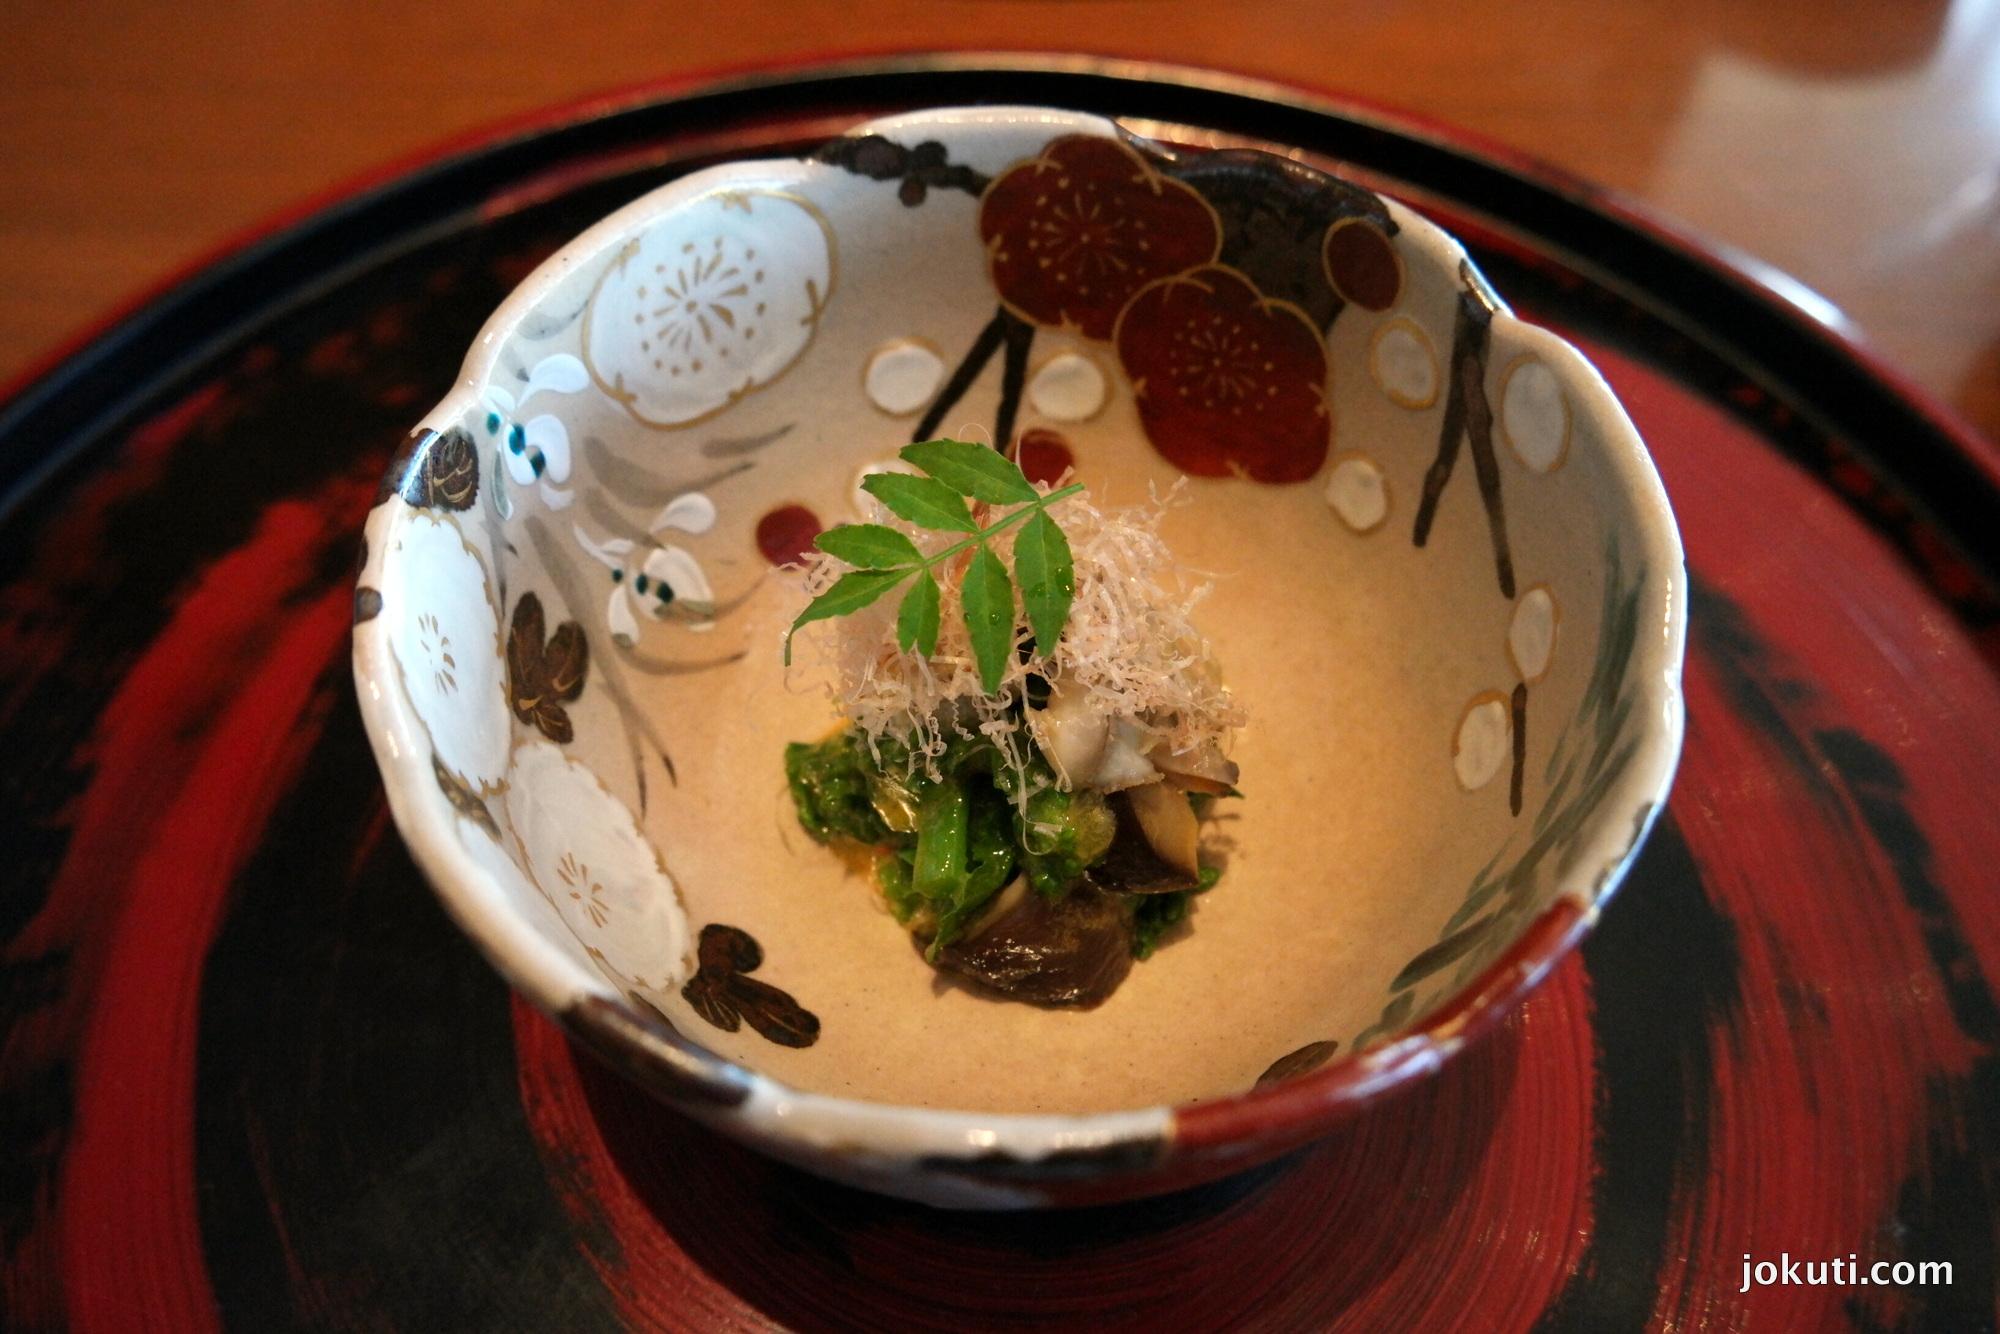 Simmered clams, natane greens, shiitake mushrooms, mustard